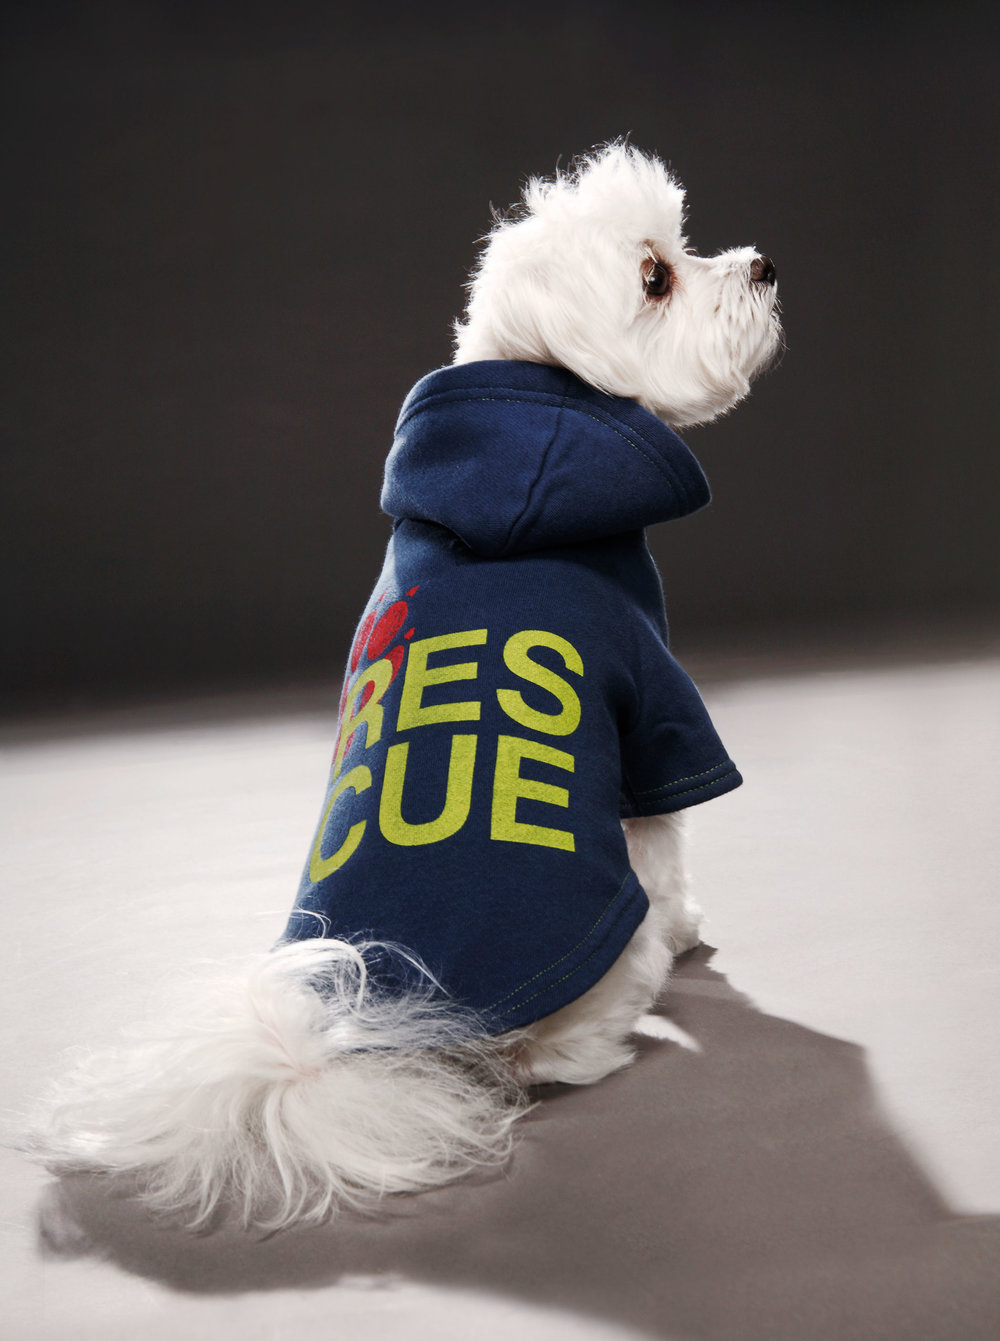 rescueblueHD.jpg